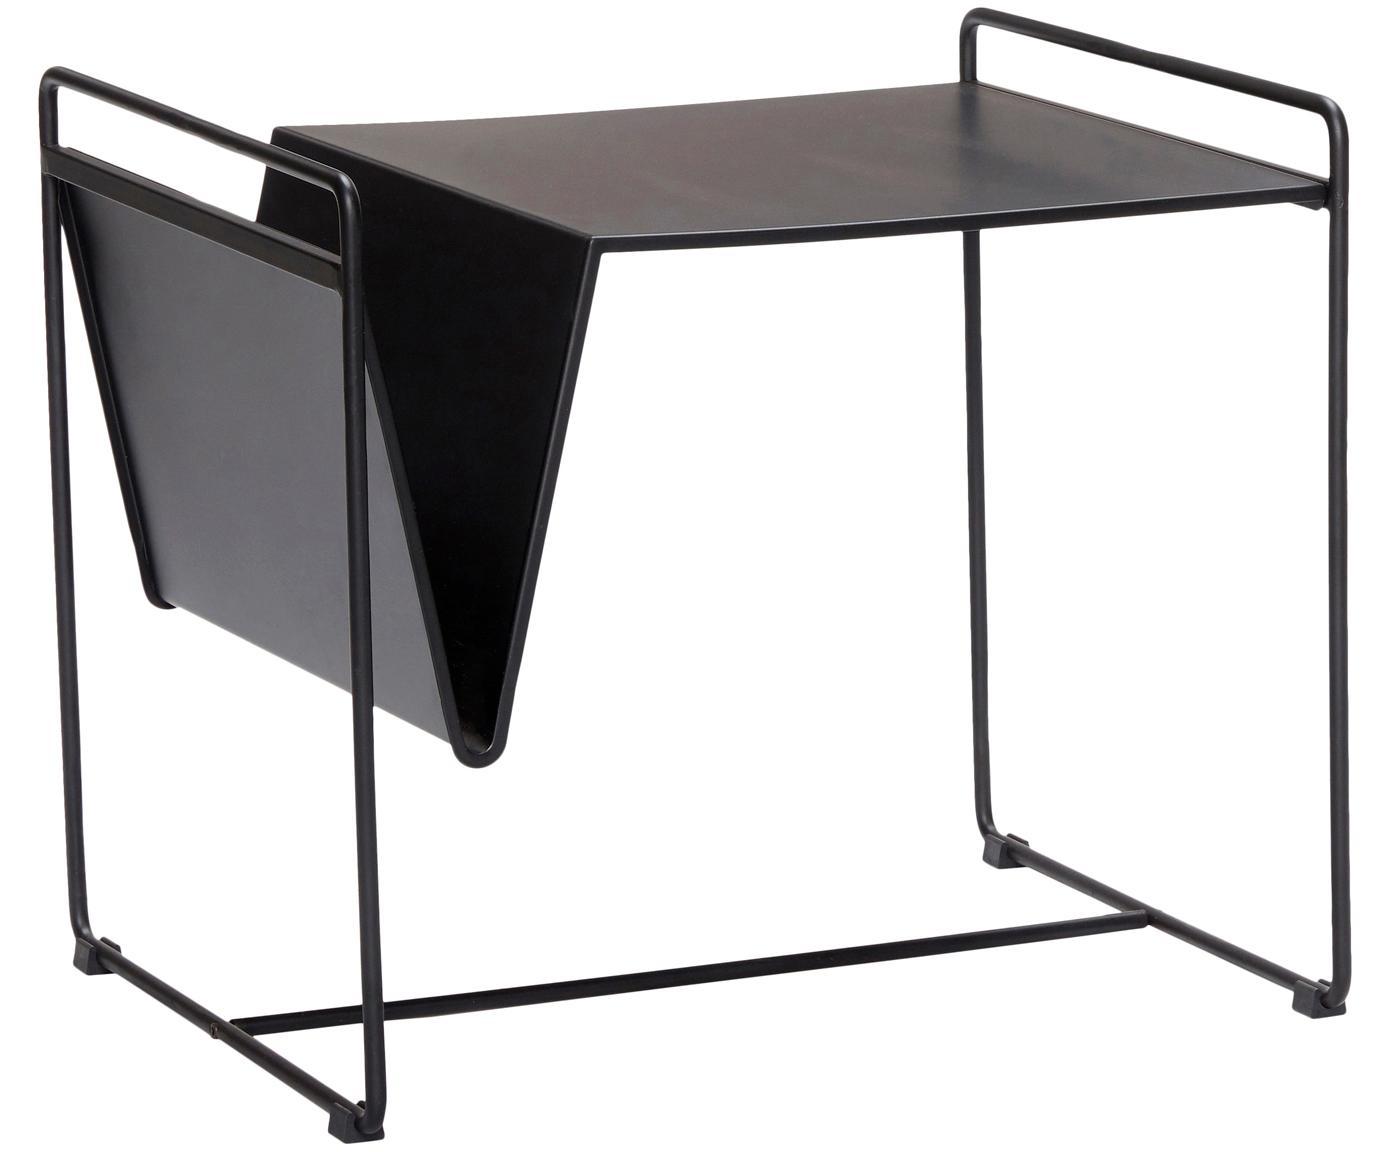 Beistelltisch Nolla, Metall, lackiert, Schwarz, 54 x 47 cm